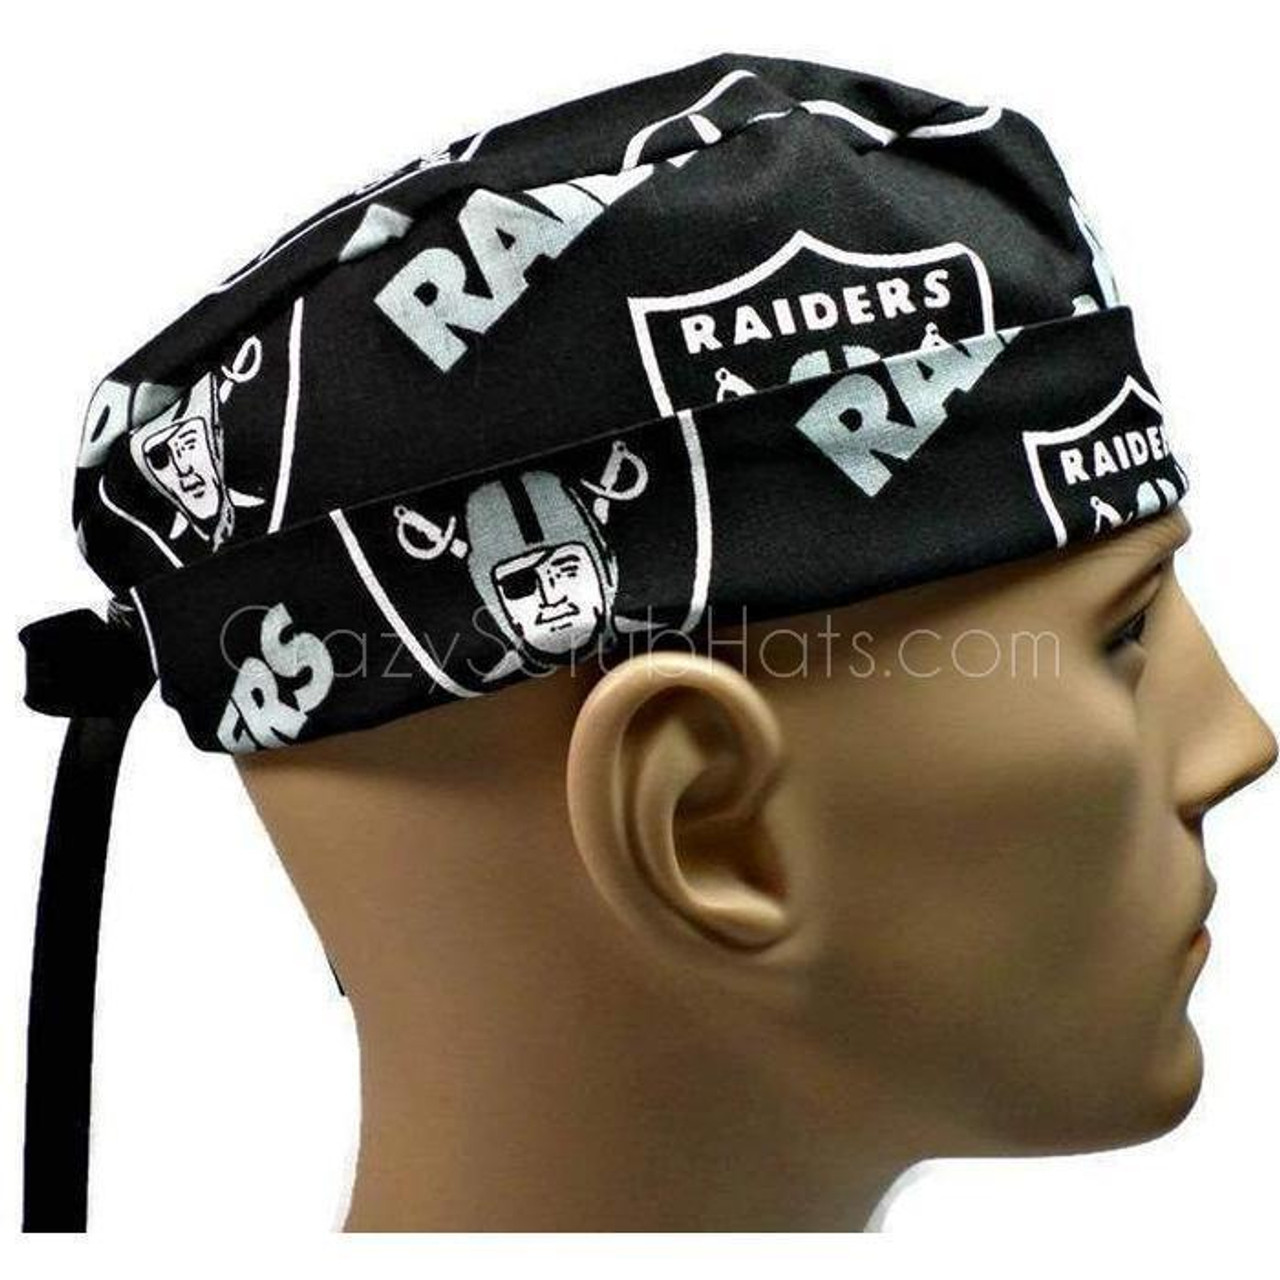 5e5bbf6c Men's Semi-Lined Fold-Up Cuffed (shown) or No Cuff Surgical Scrub Hat  Handmade with Oakland Raiders Black fabric